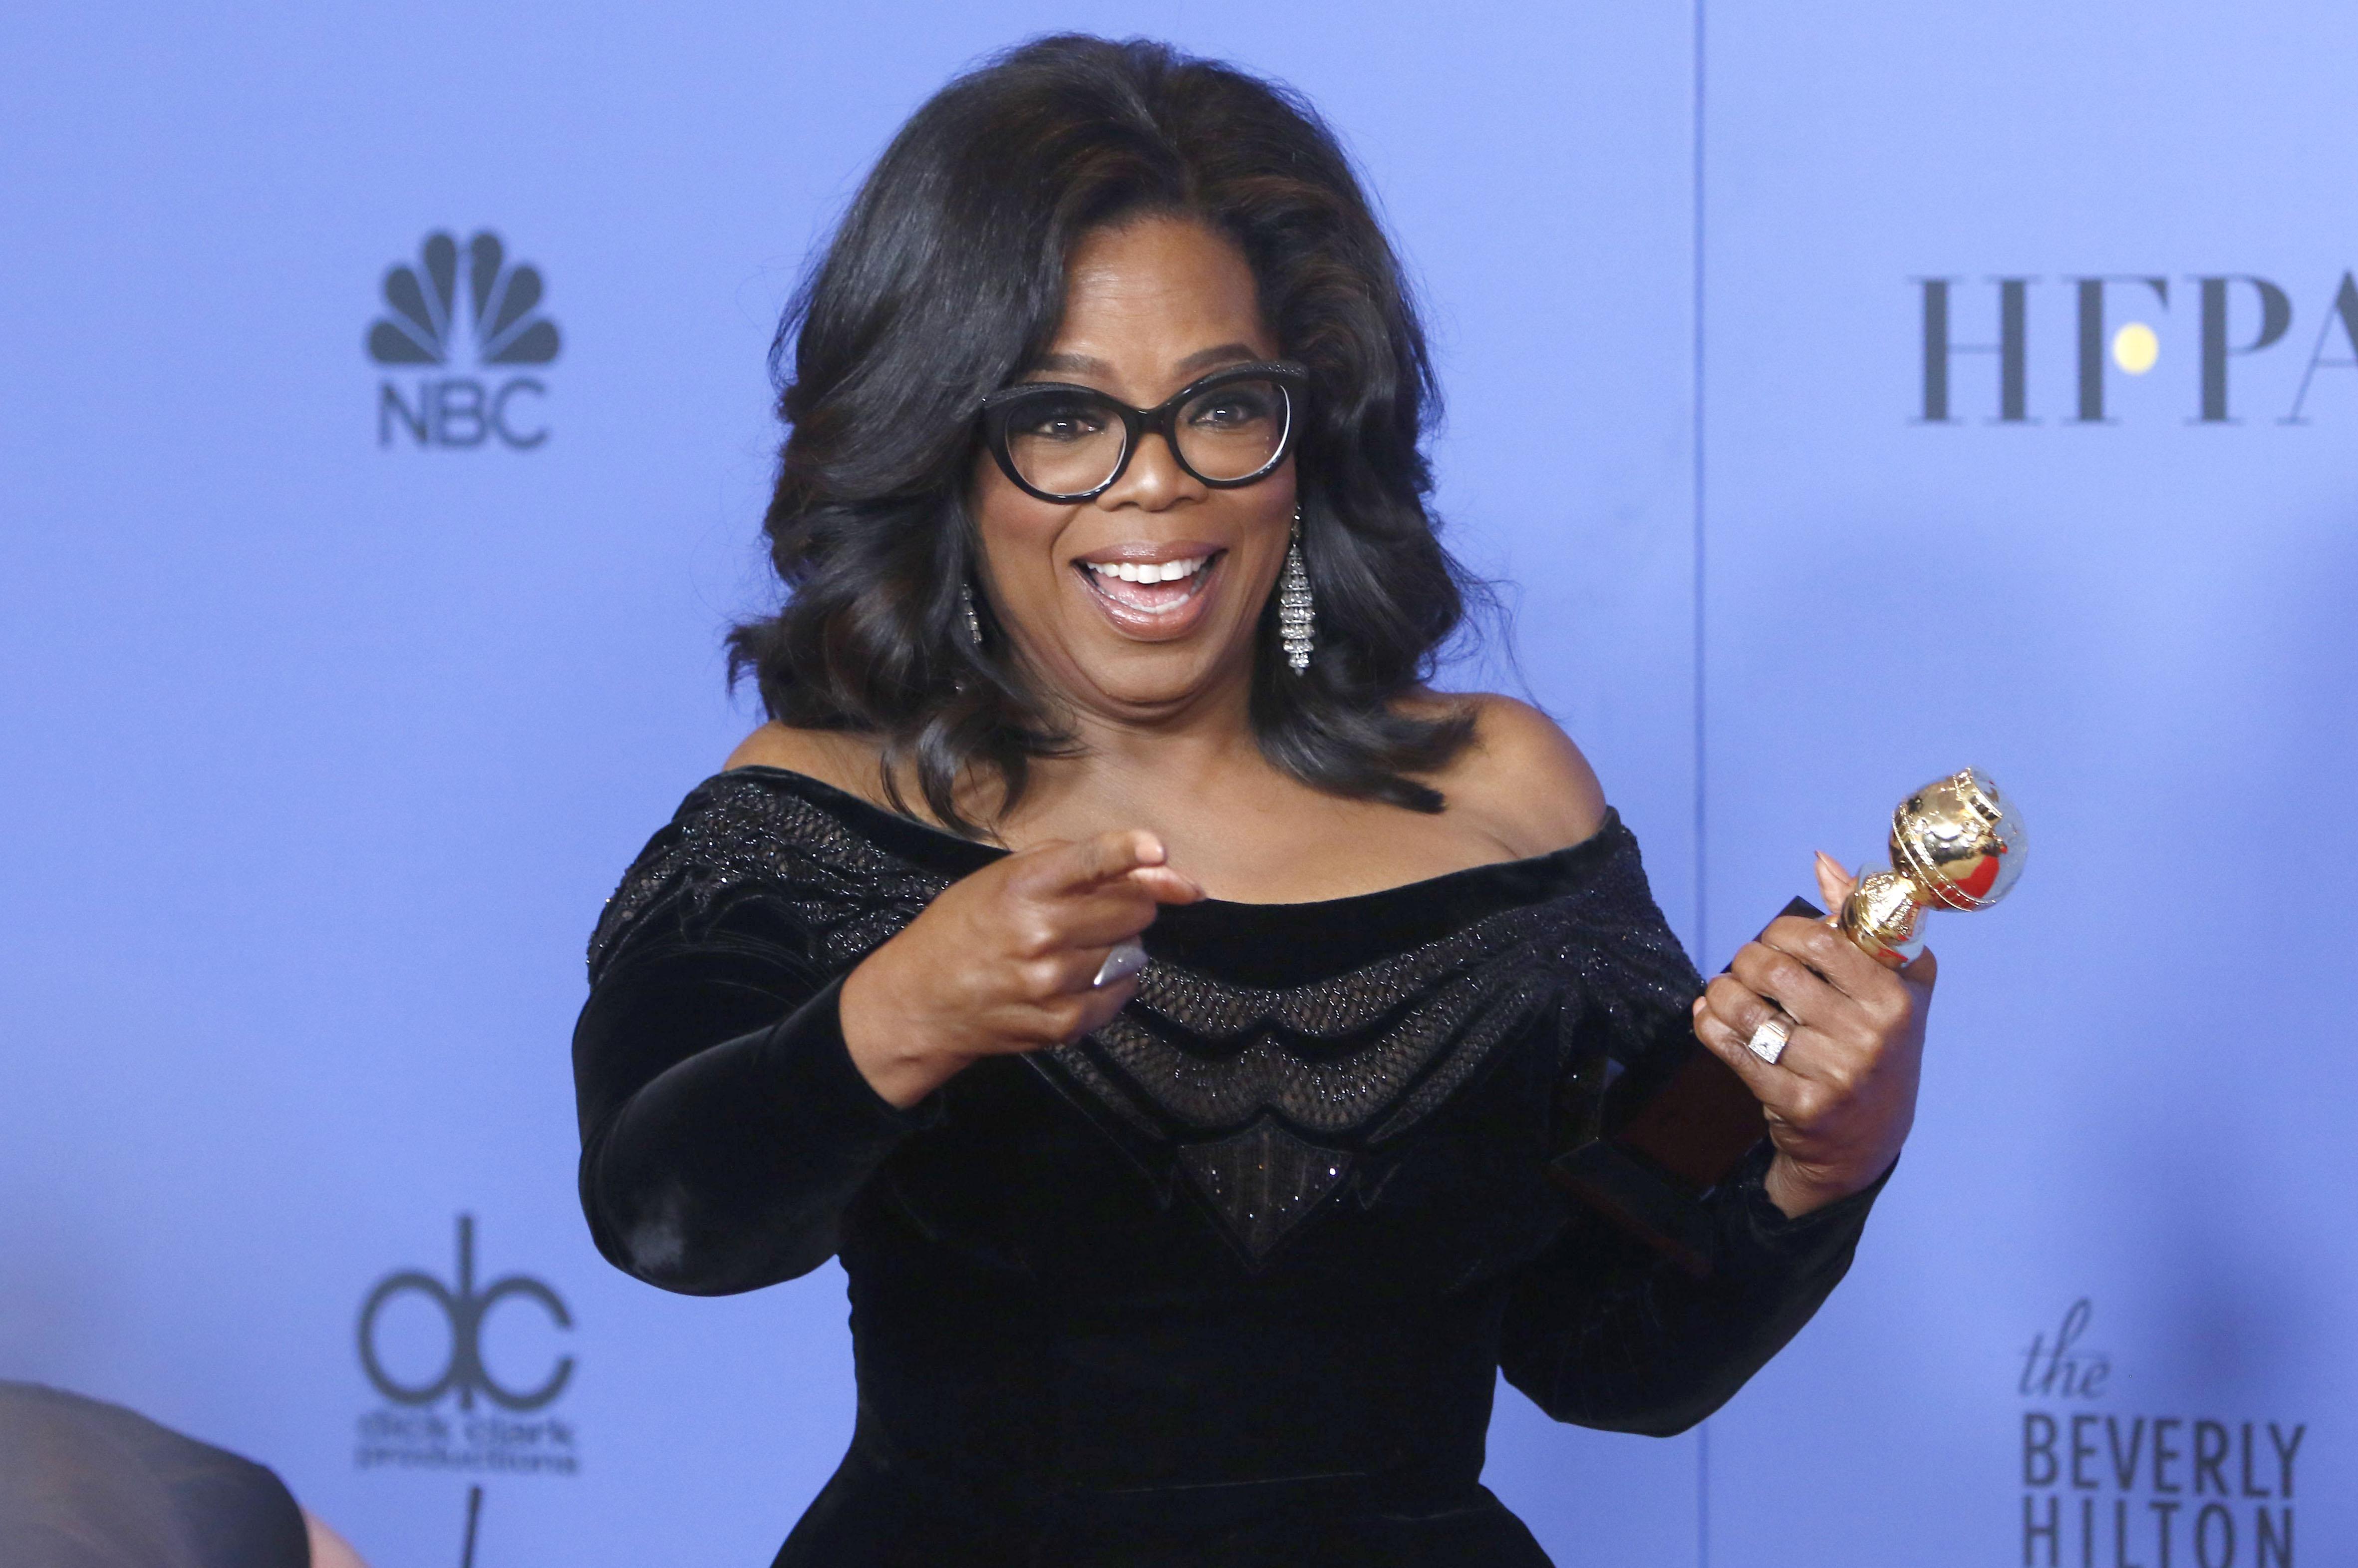 75th Golden Globe Awards - Press Room